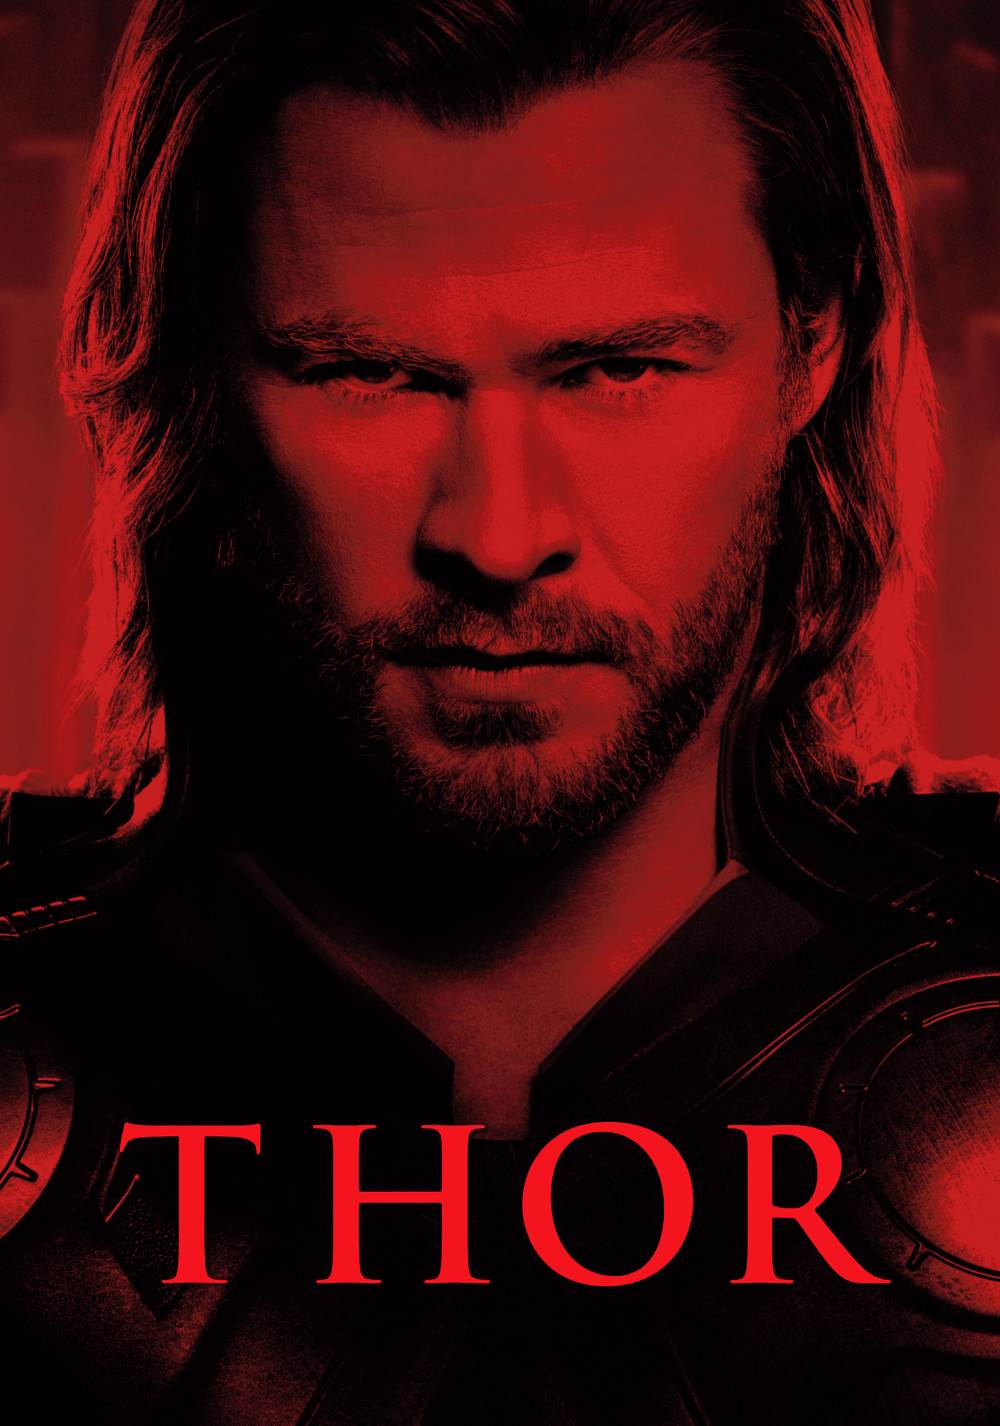 Thor Imdb